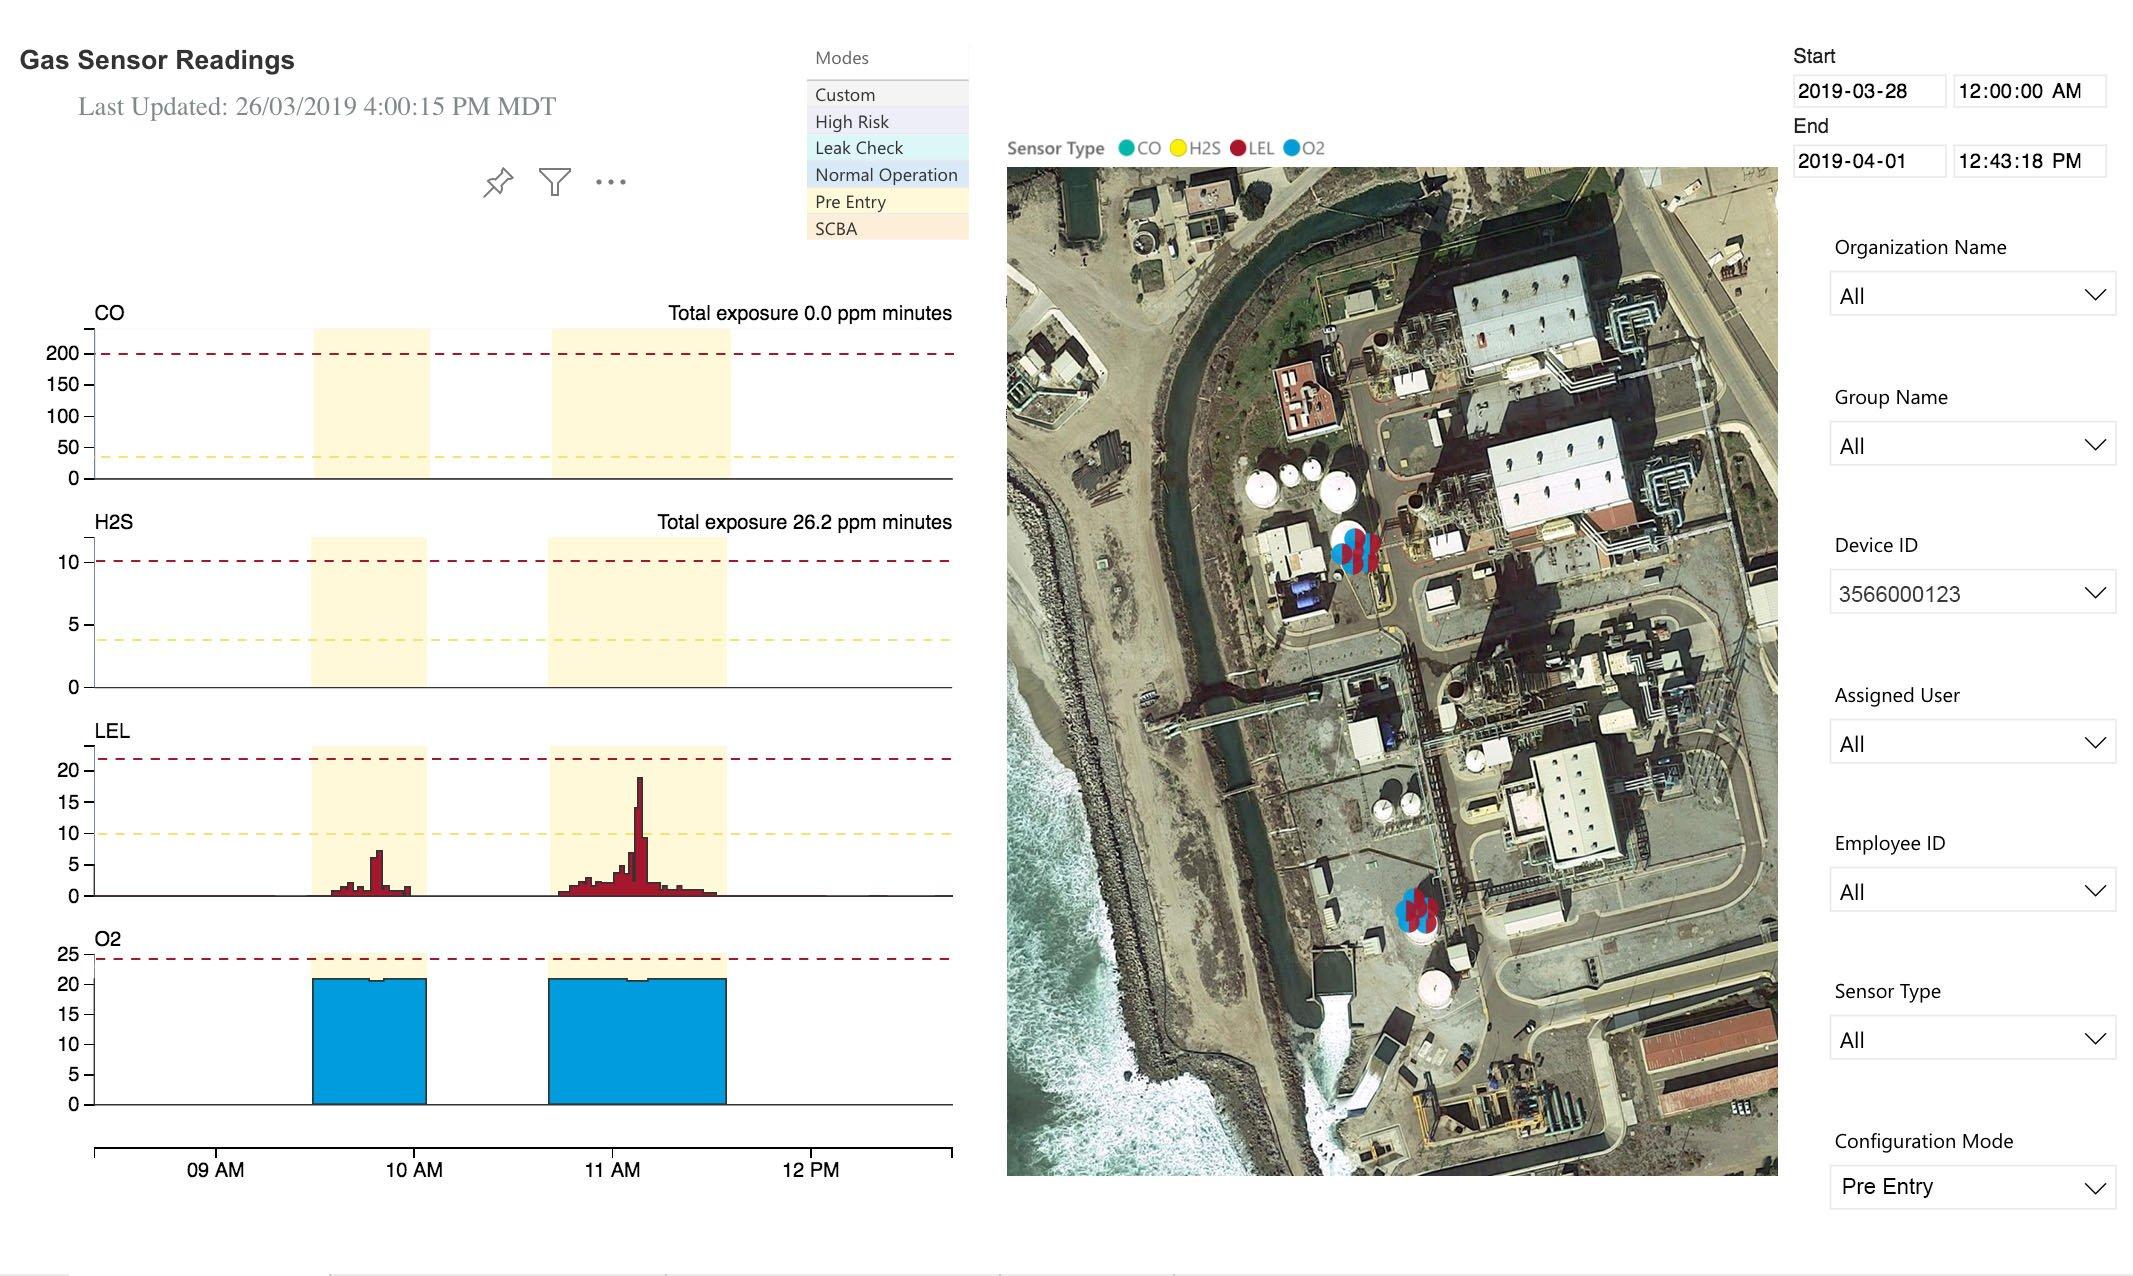 Blackline Analytics Gas Sensor Readings report